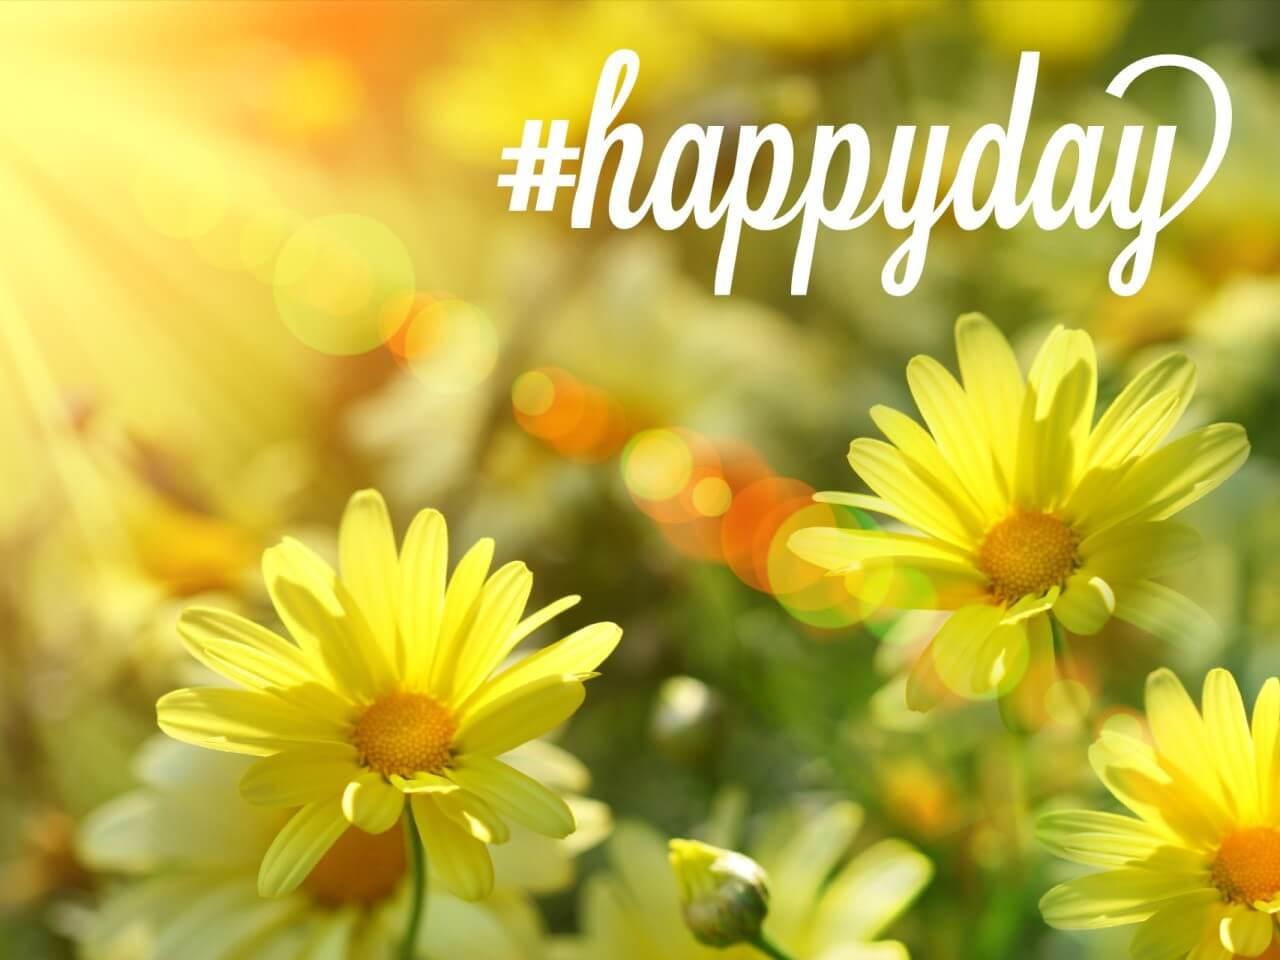 international day of happiness desktop wallpaper